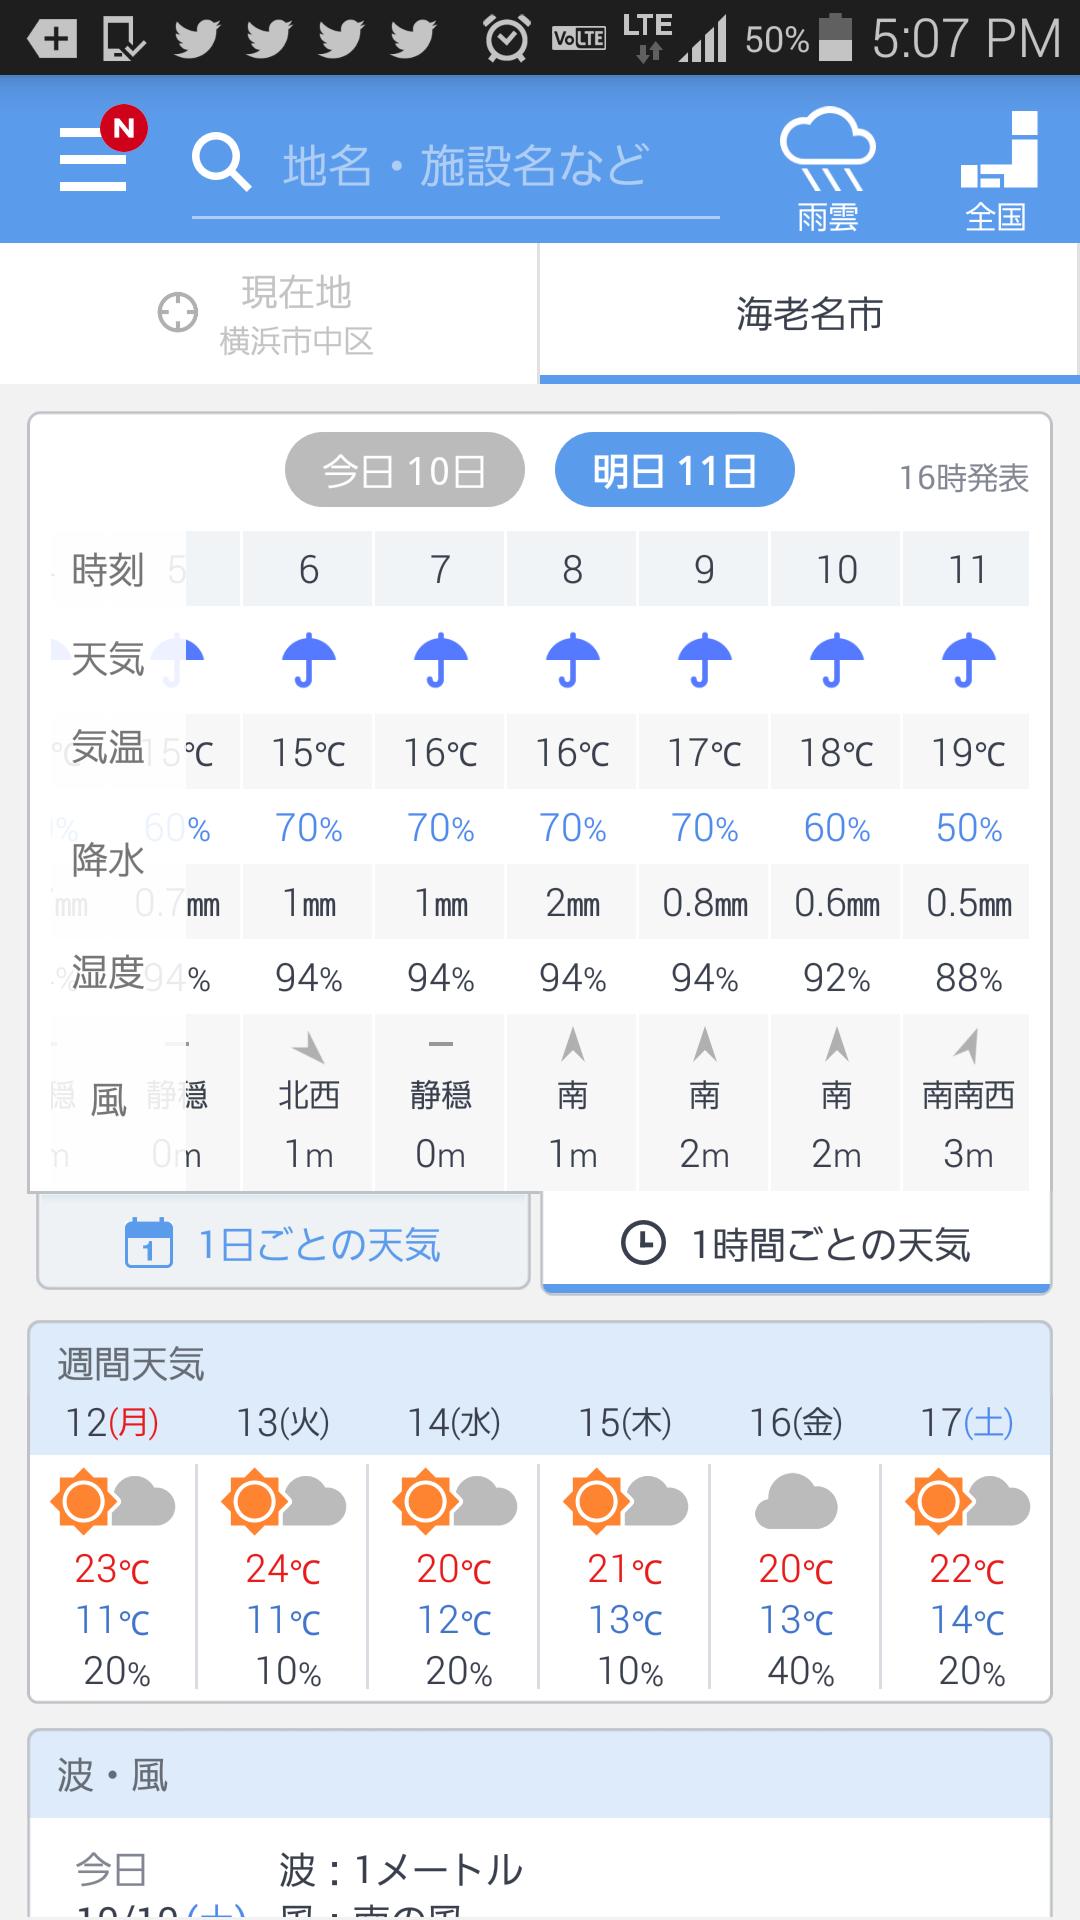 Screenshot_2015-10-10-17-07-10.png